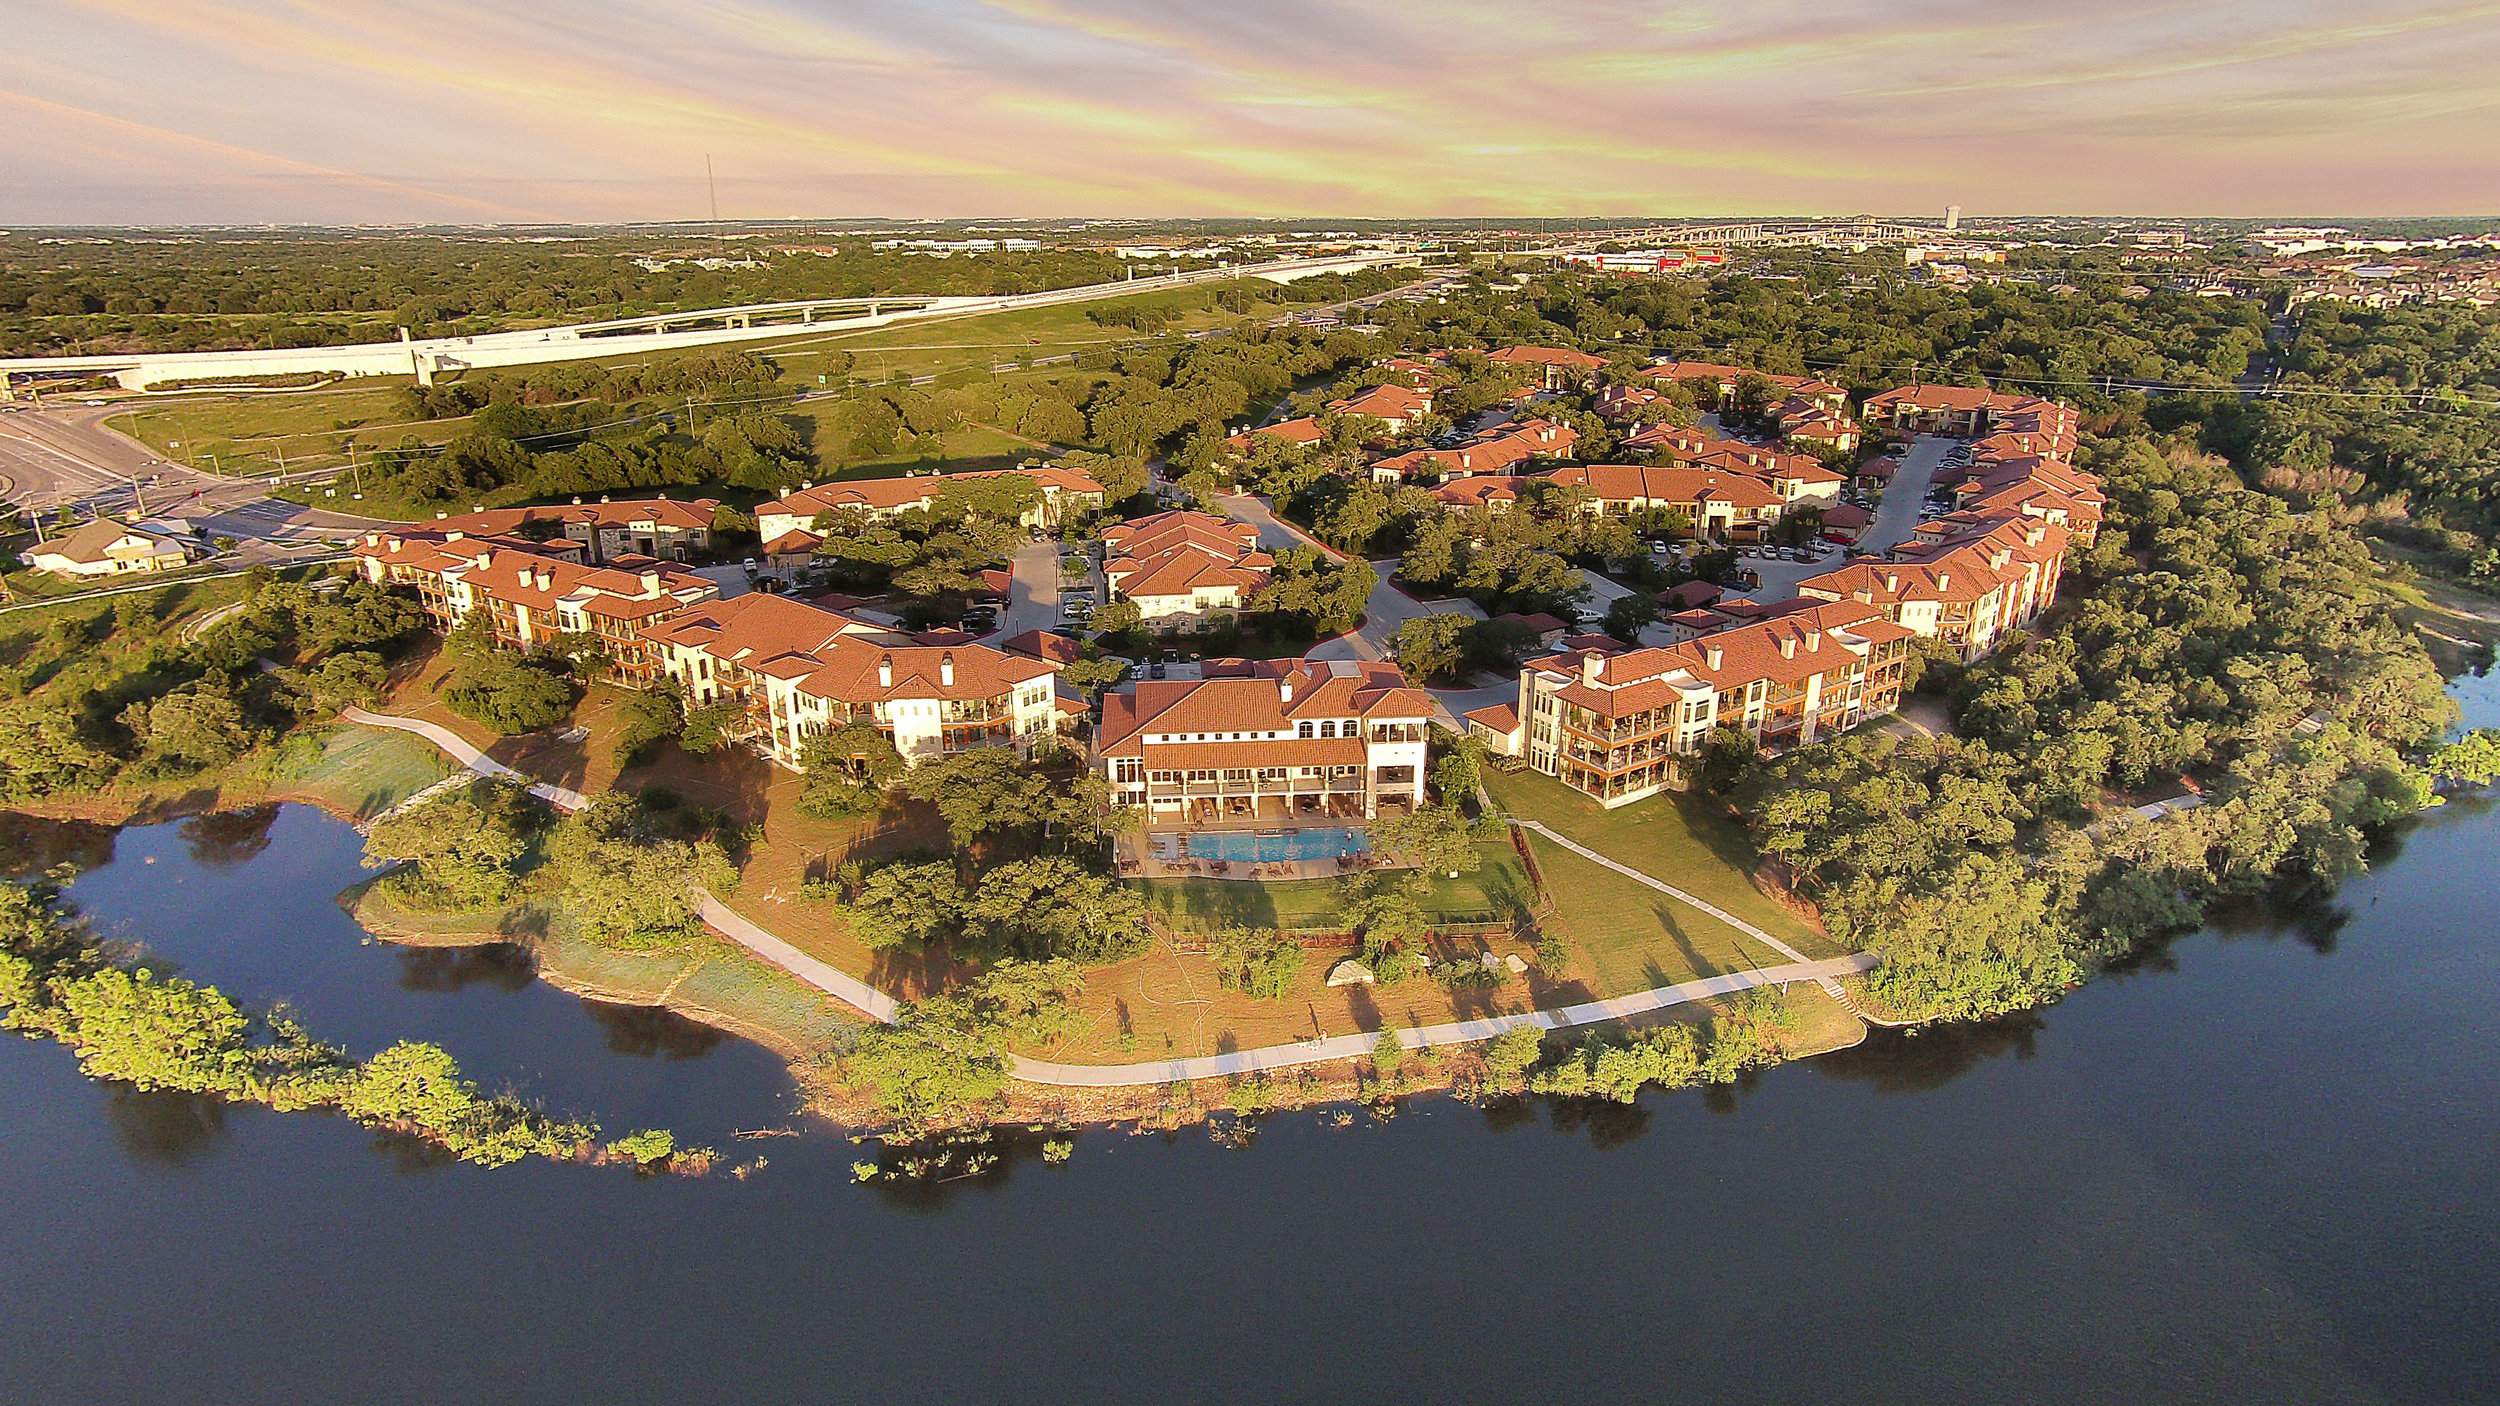 Muir Lake - Cedar Park, Texas (View from above)